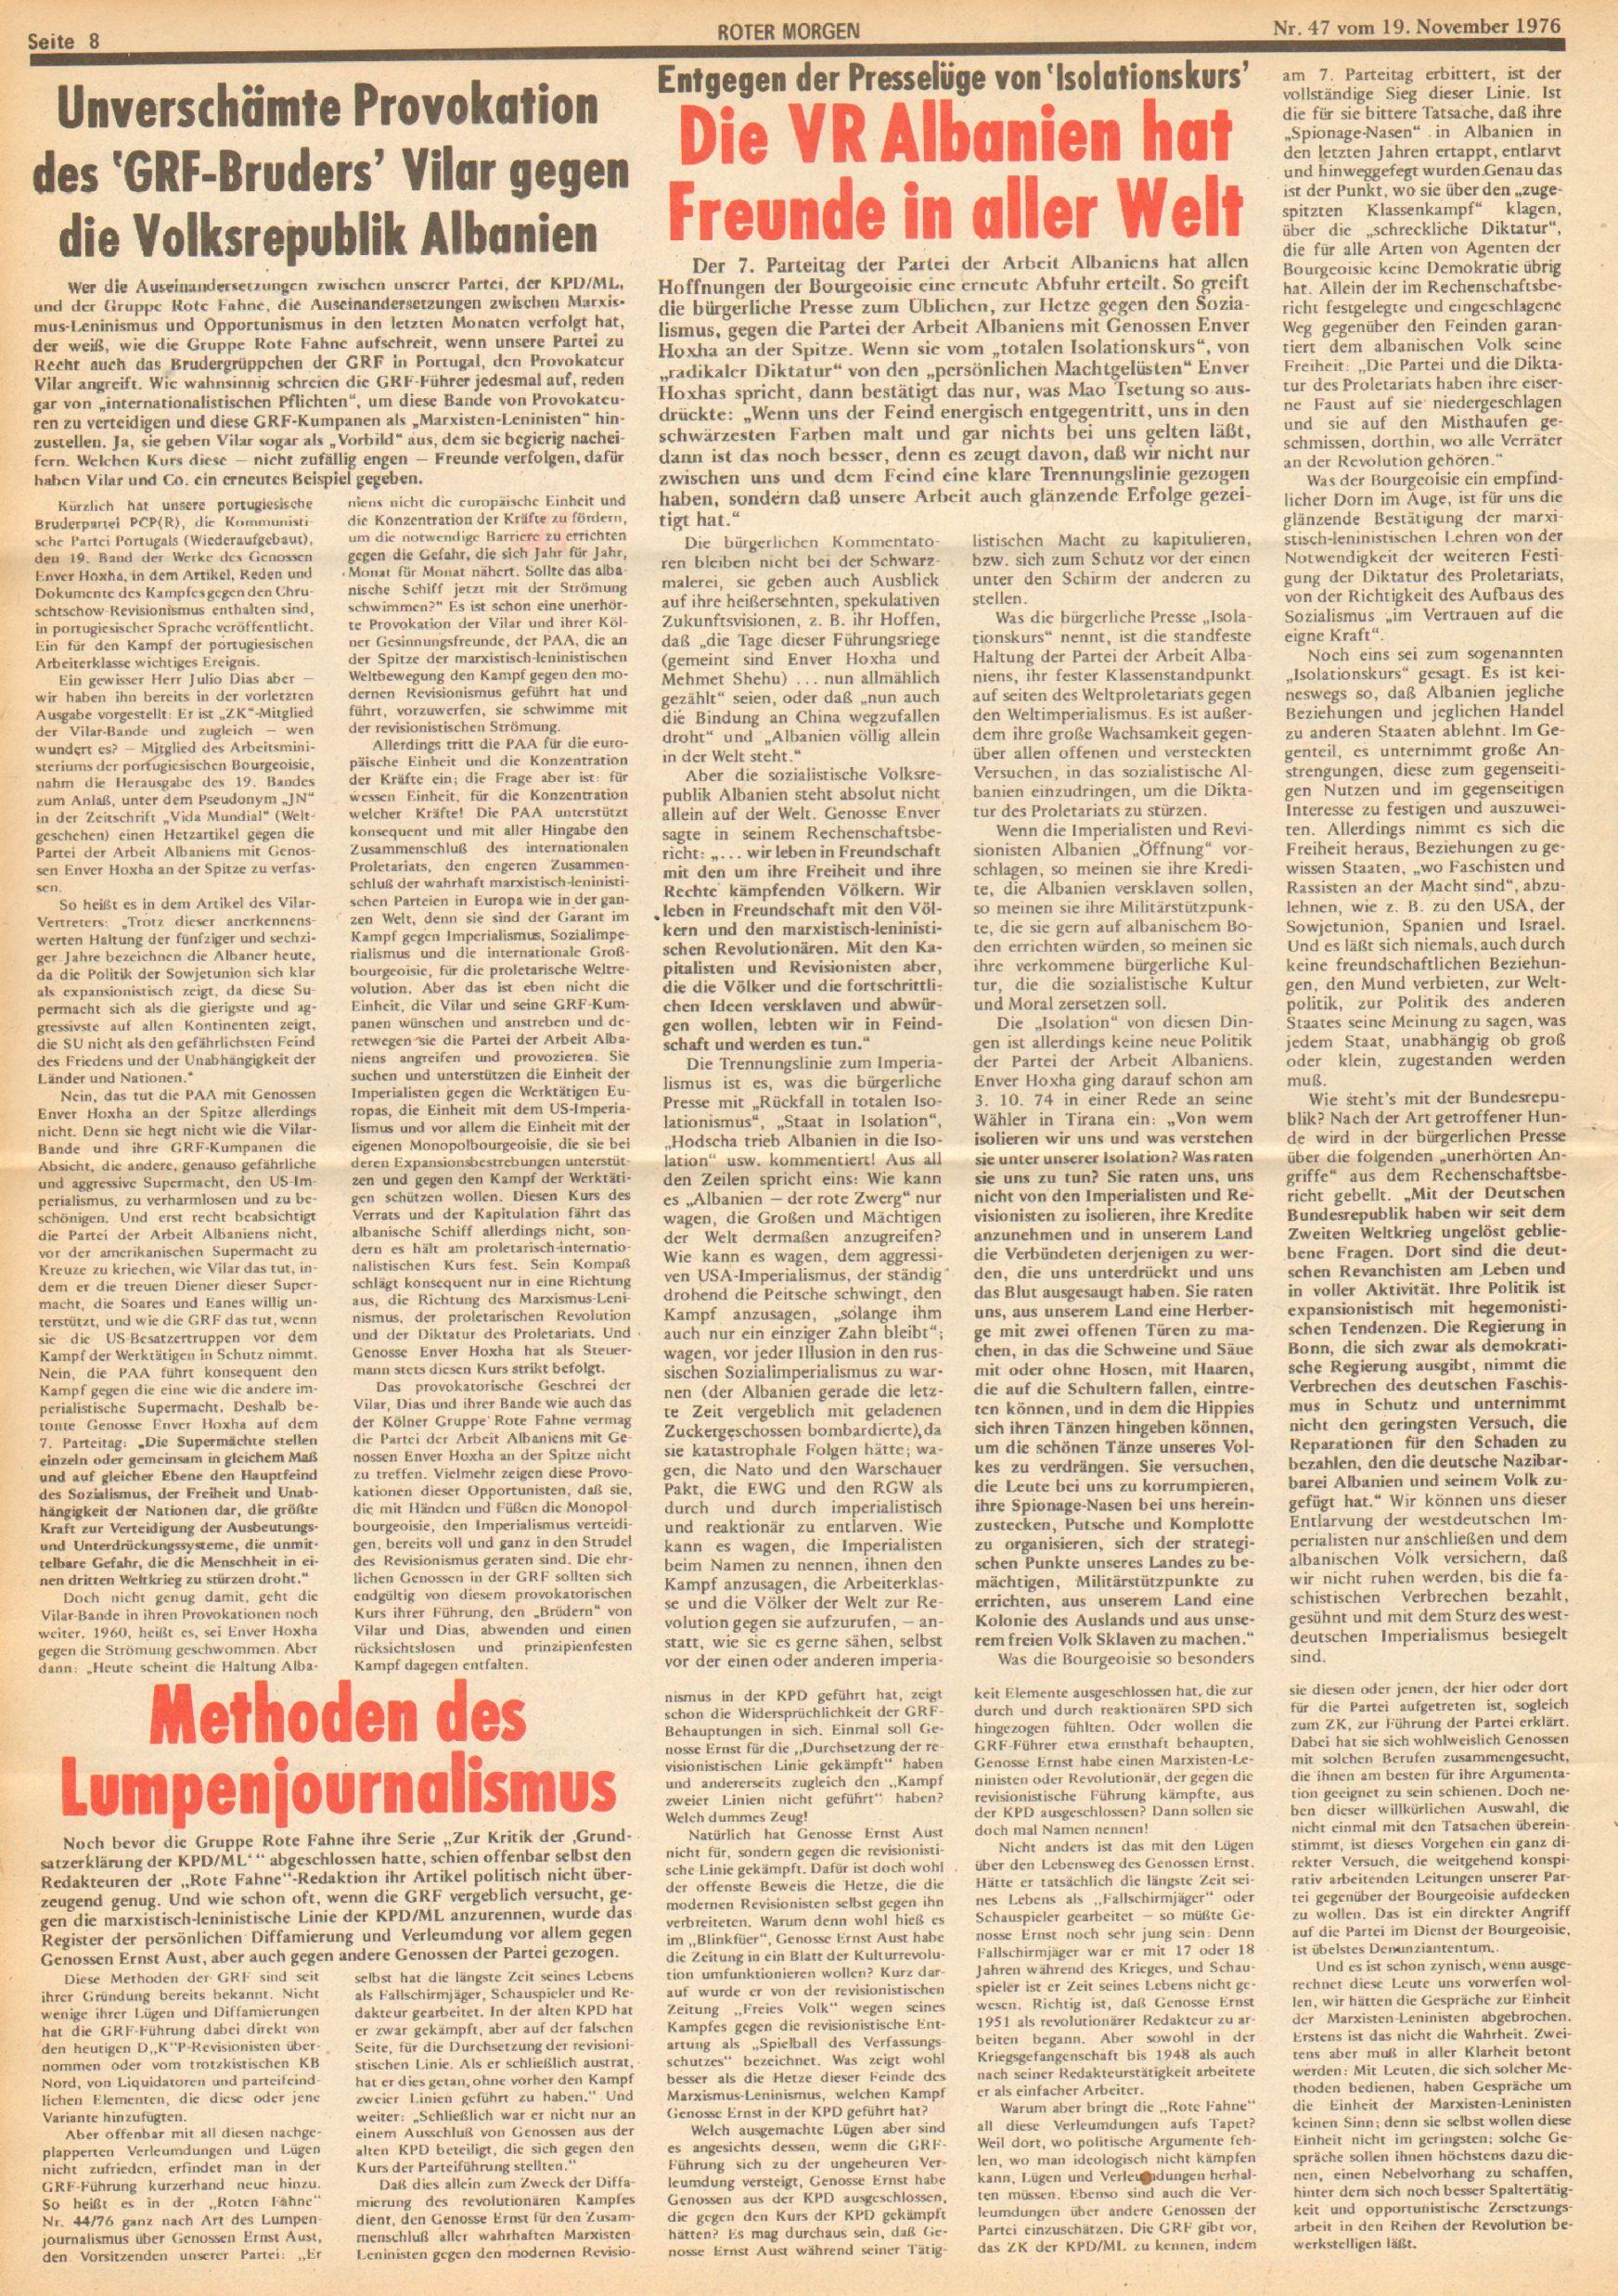 Roter Morgen, 10. Jg., 19. November 1976, Nr. 47, Seite 8